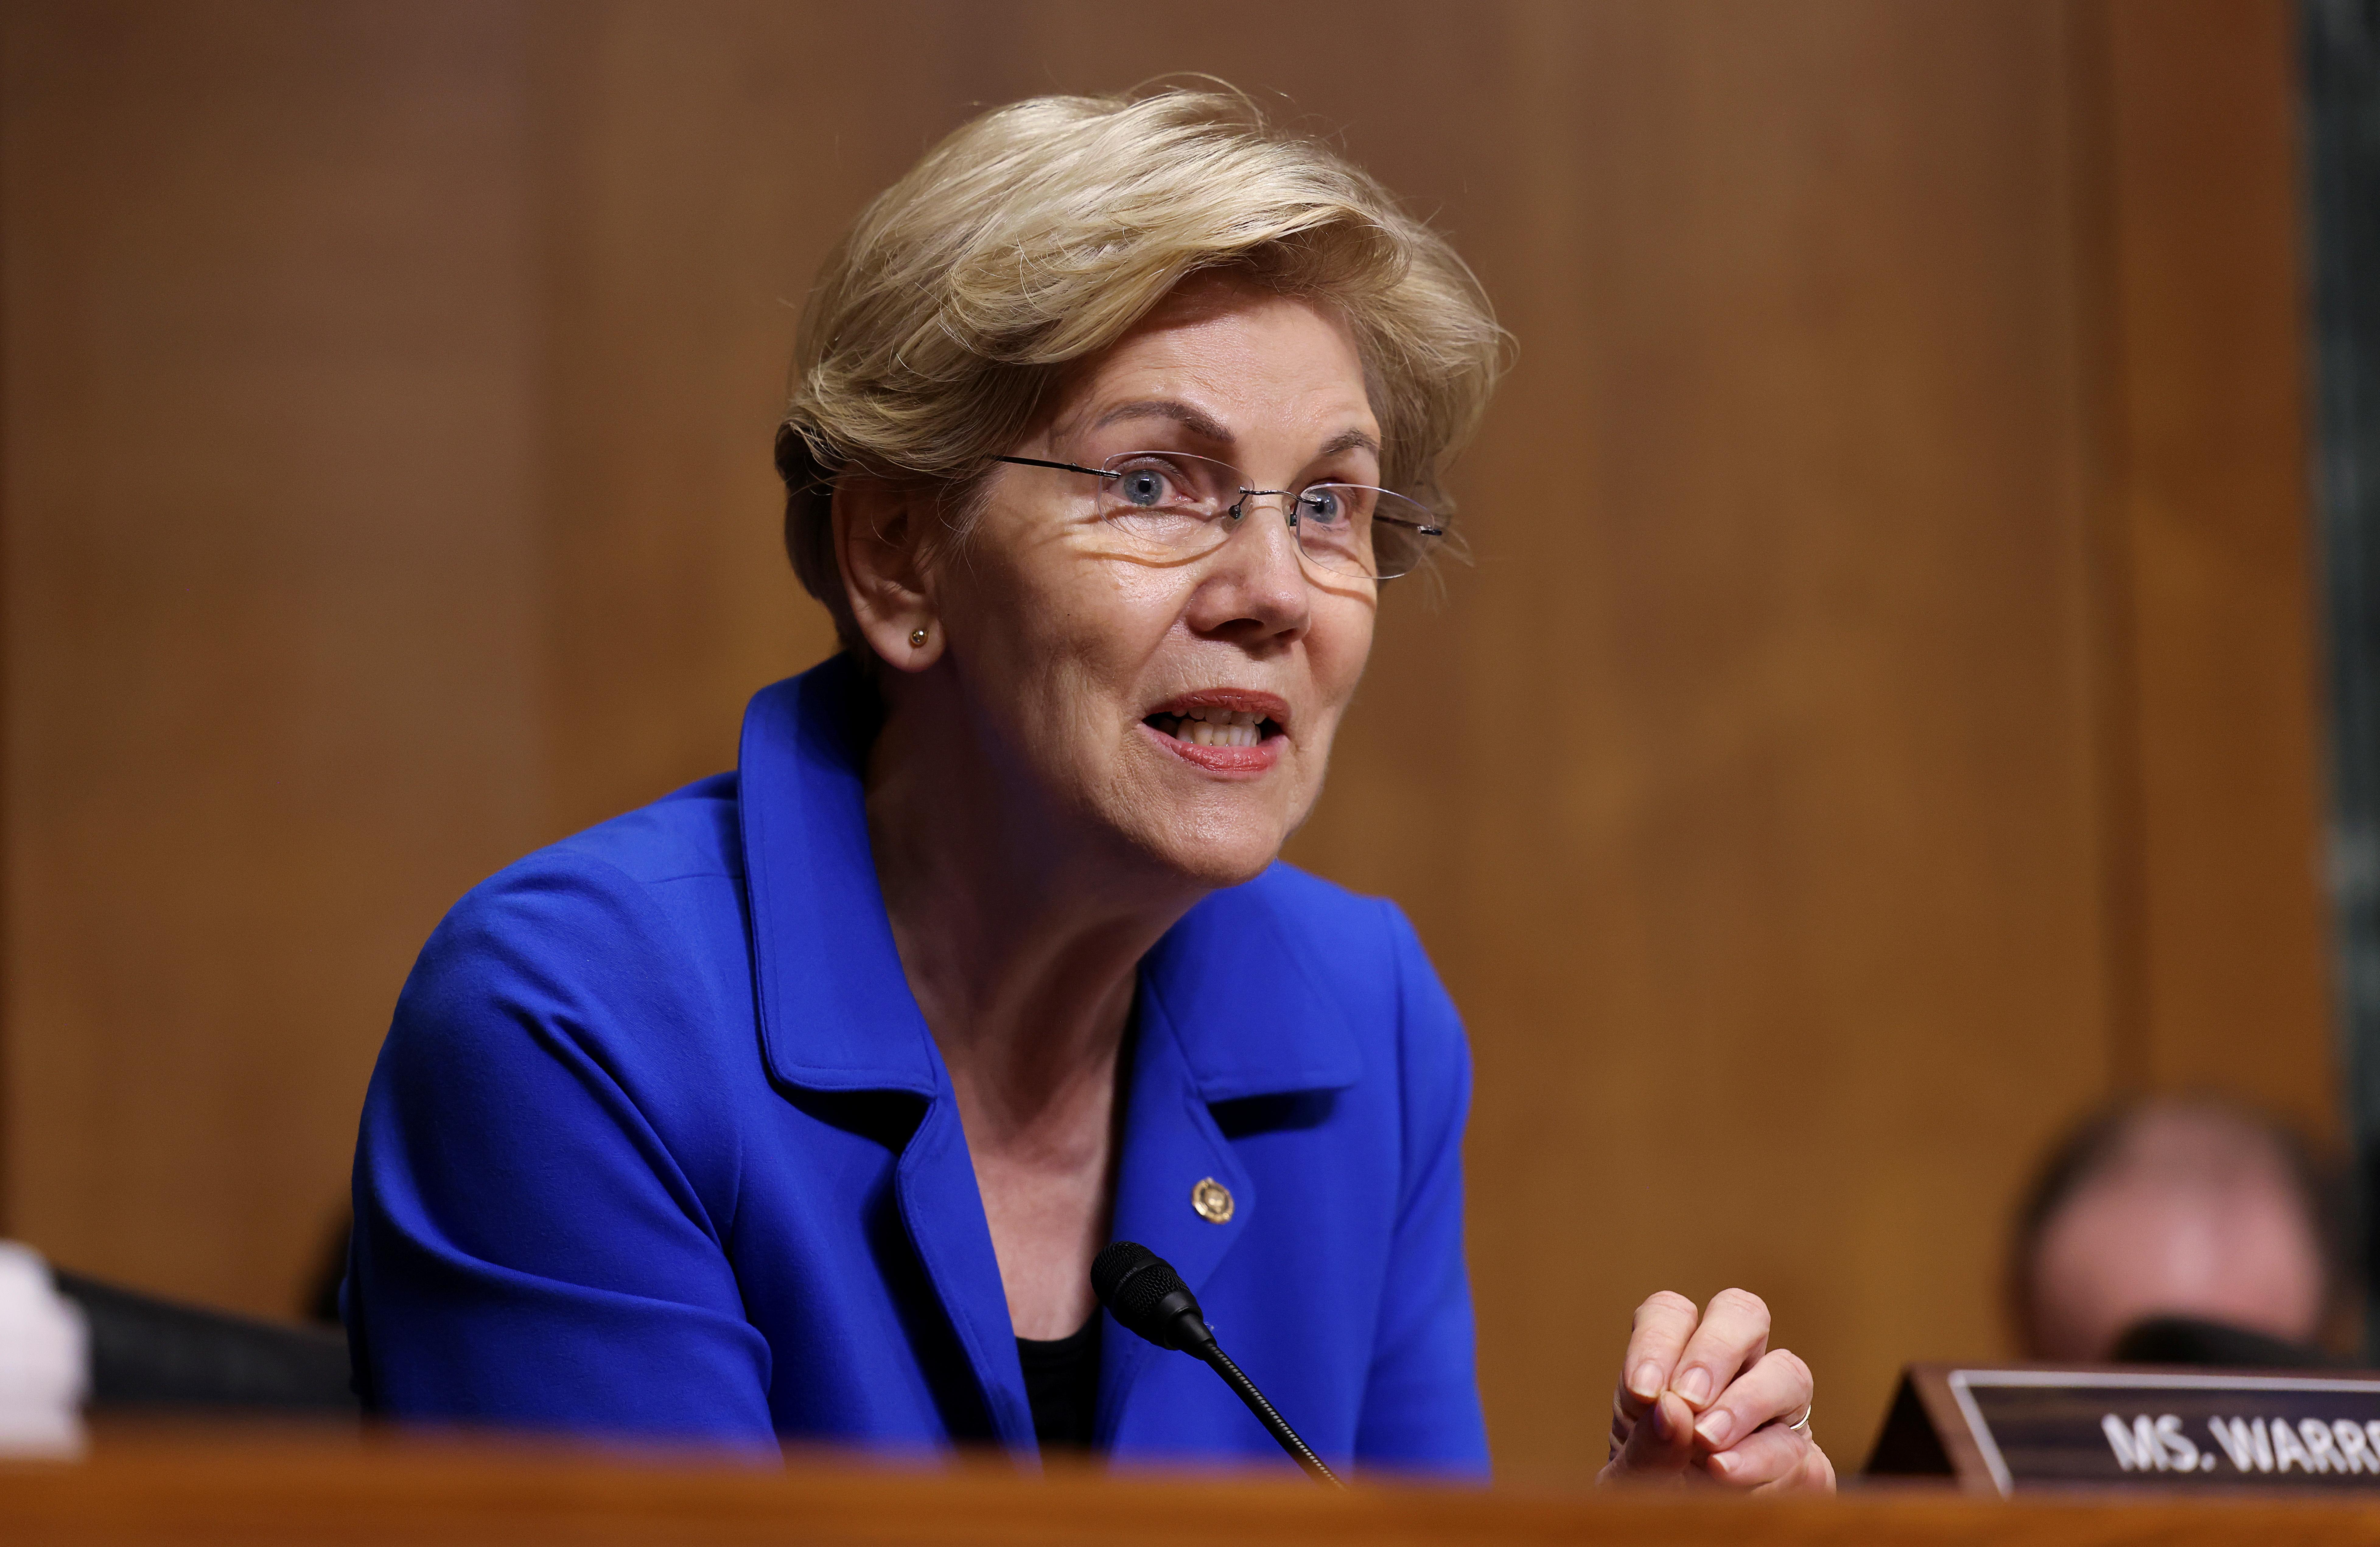 U.S. Senator Elizabeth Warren (D-MA) speaks during a Senate Finance Committee hearing on the IRS budget request on Capitol Hill in Washington U.S., June 8, 2021. REUTERS/Evelyn Hockstein/Pool